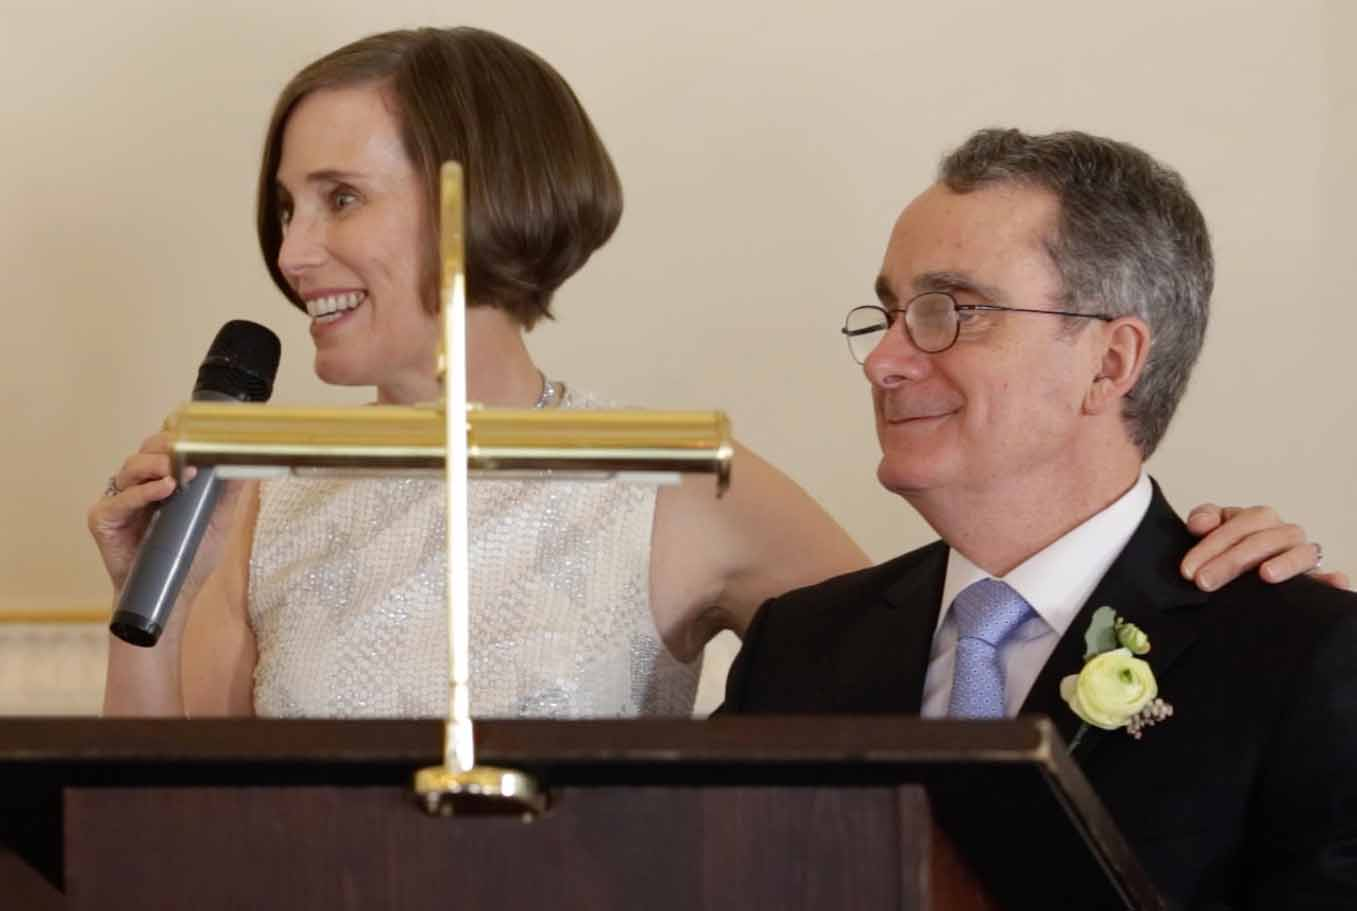 Destination Wedding Celebration for Doug Jones & Janet Walker: Canada + Australia + United Kingdom